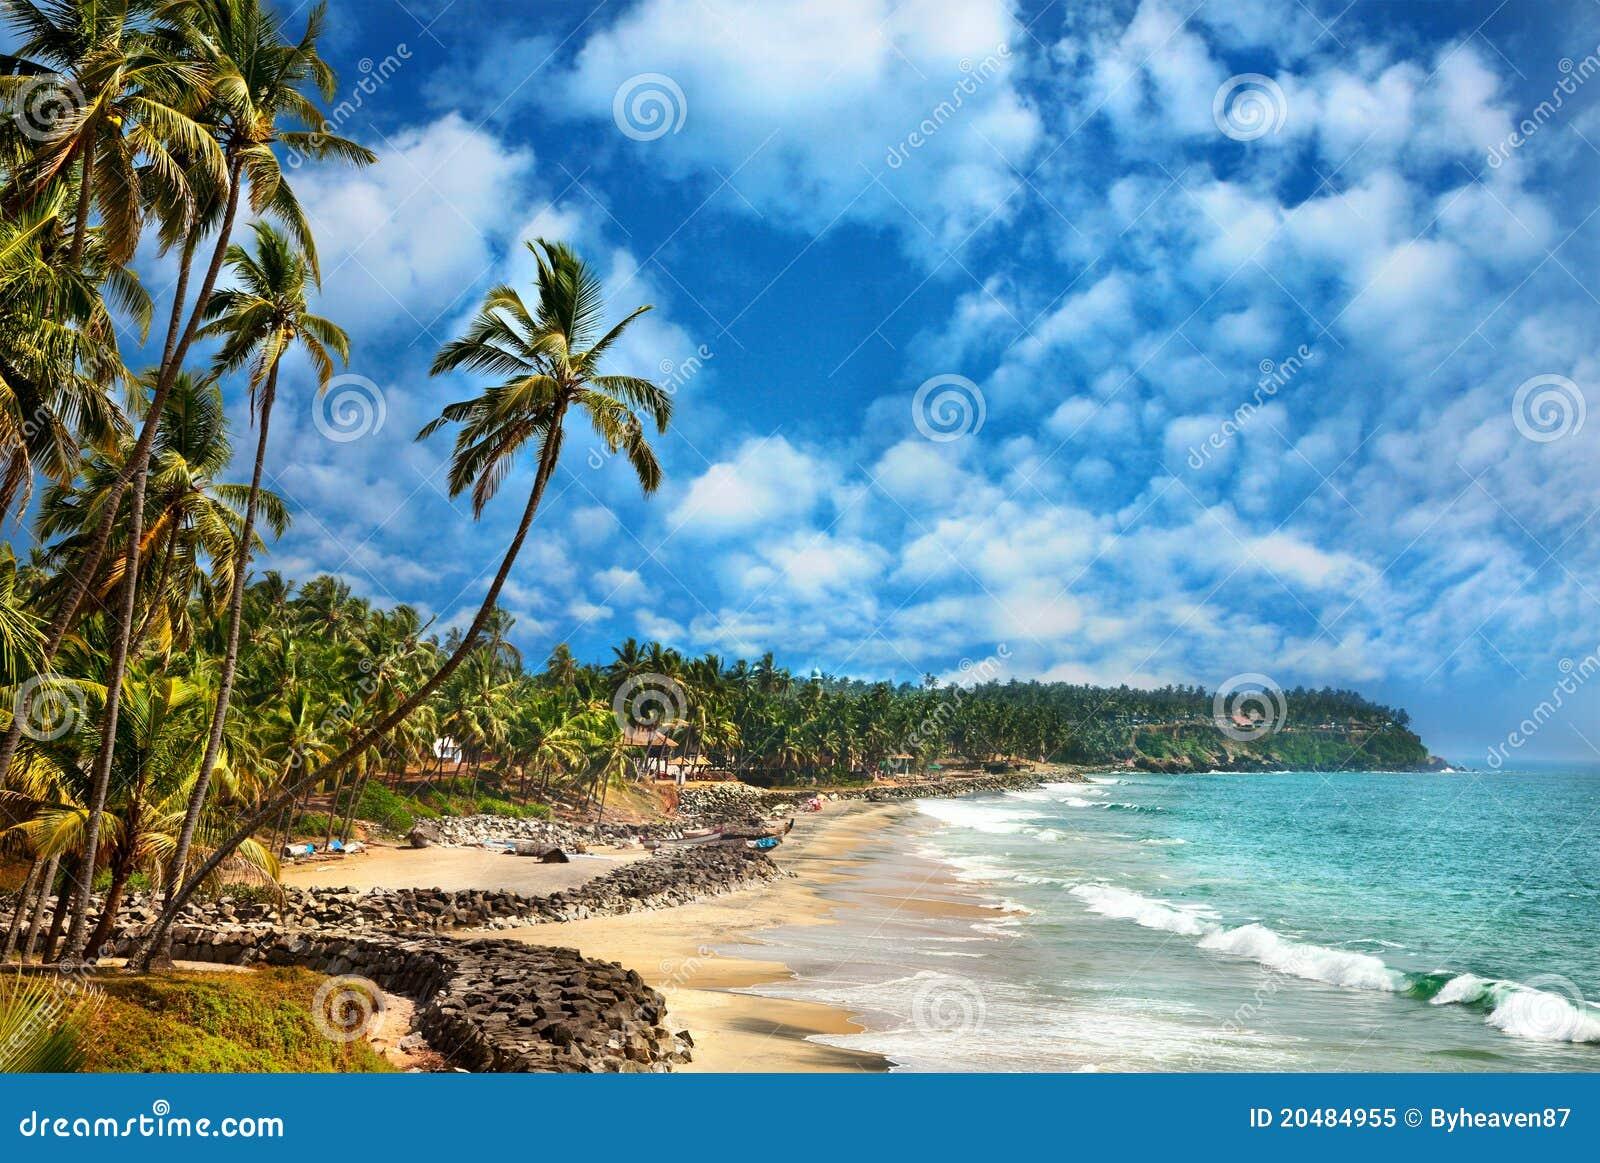 Ocean View In Varkala Kerala India Royalty Free Stock Photo - Image ...